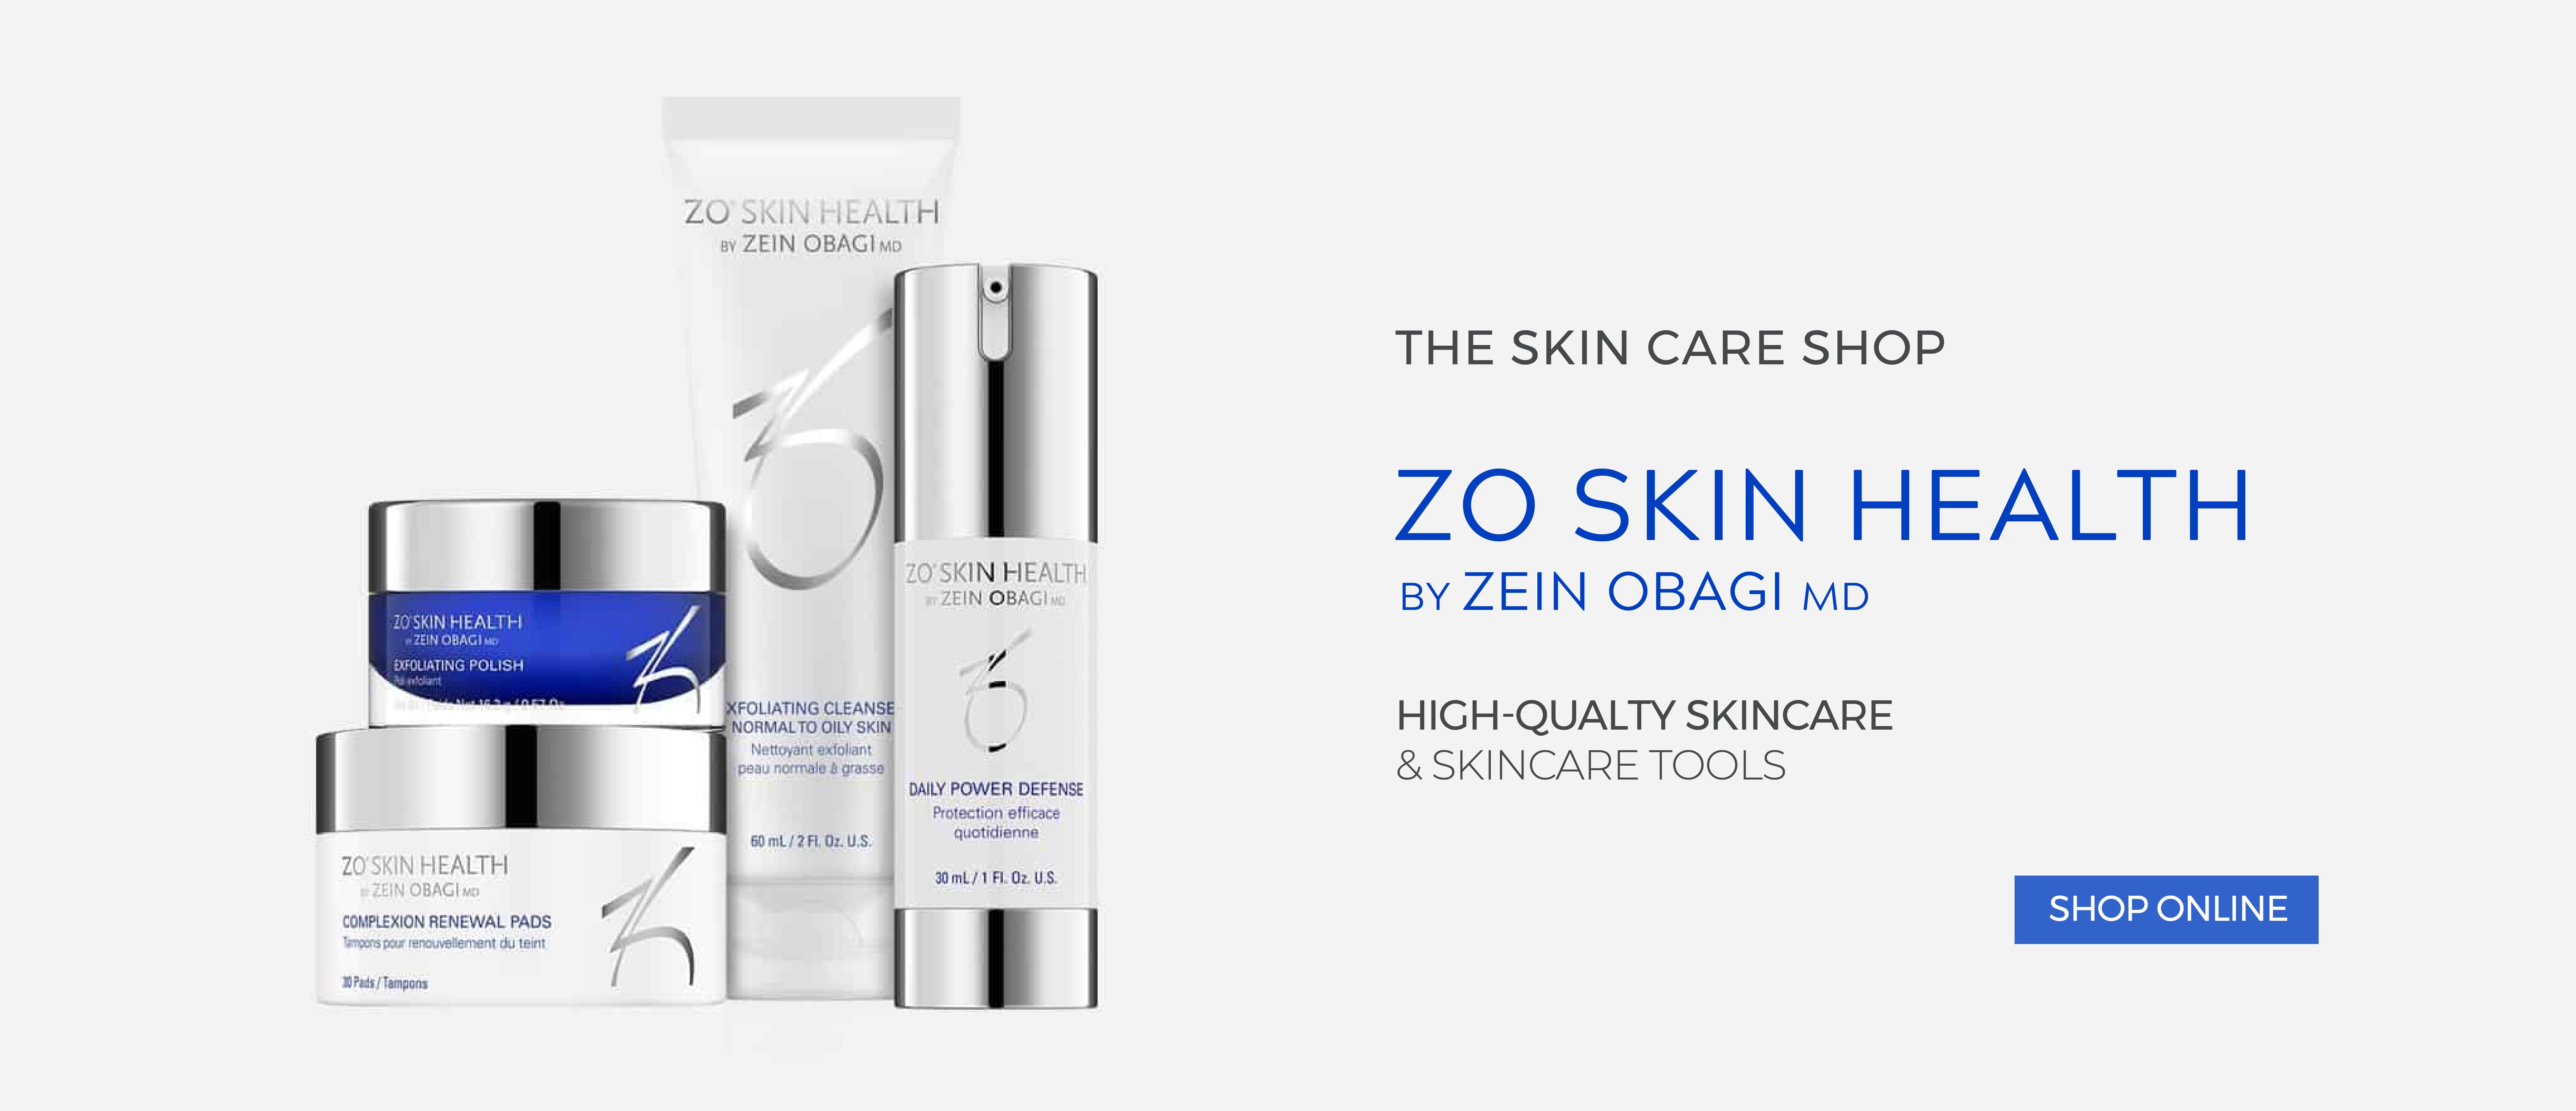 ZO Skin Health Skincare available at Papillon Bleu Aesthetics, The Skincare Shop